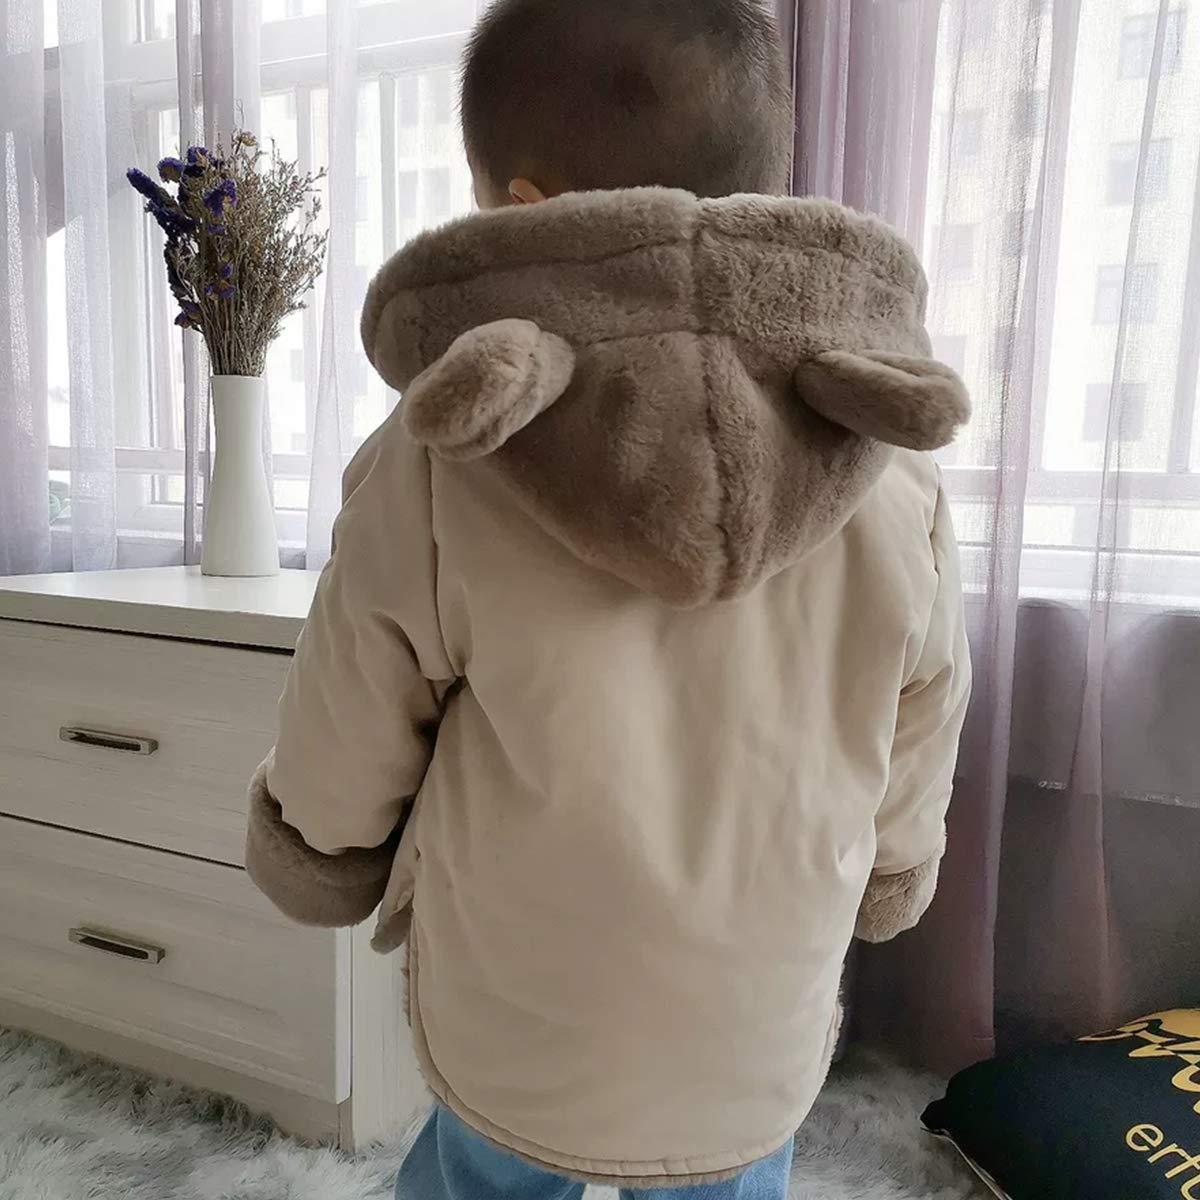 Warm Cotton Baby Winter Coats NinkyNonk Toddler Fleece Jacket Kids Hooded Outerwear for Boys Girls